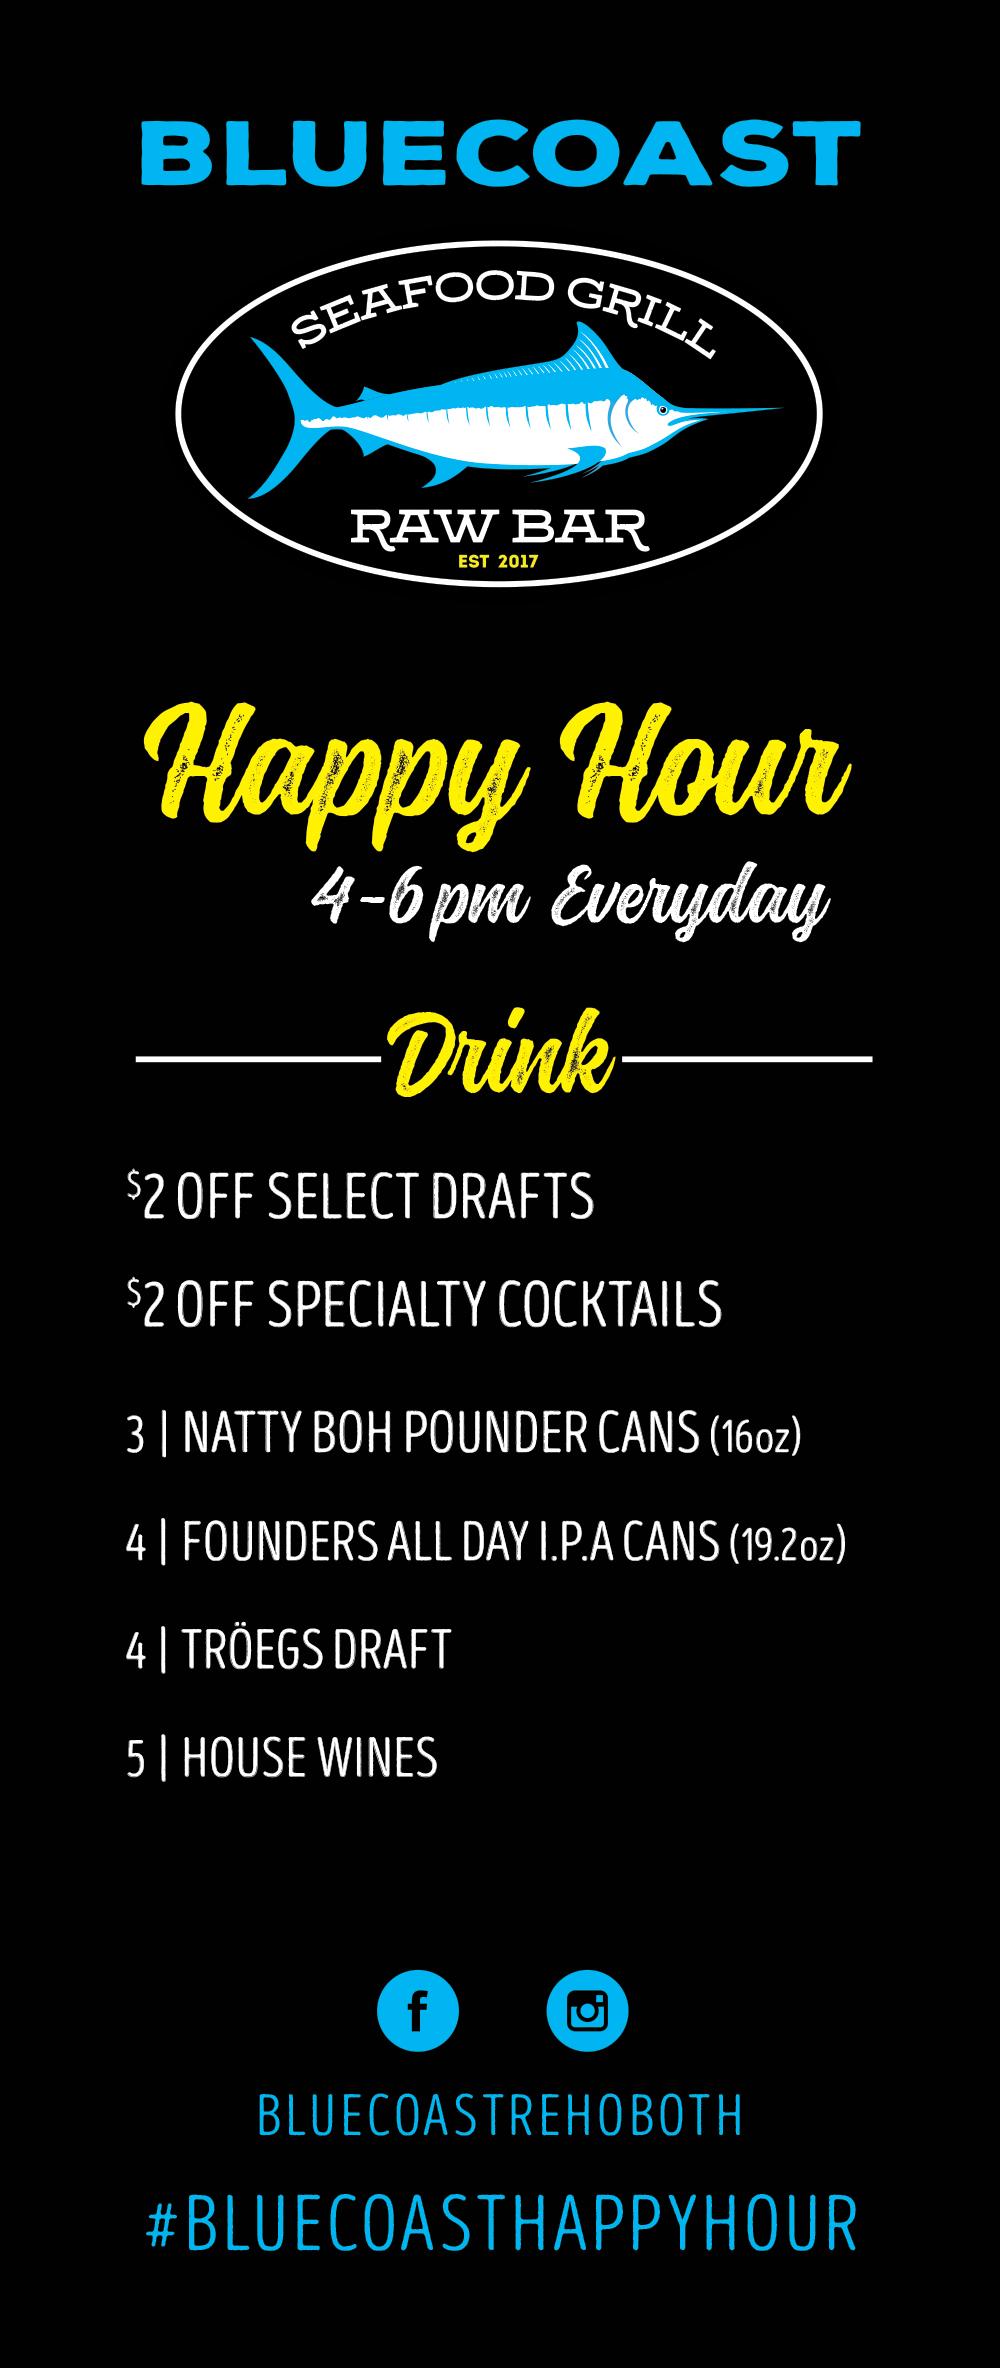 bluecoast_rehoboth_happy_hour_drink_menu_summer_2017.jpg